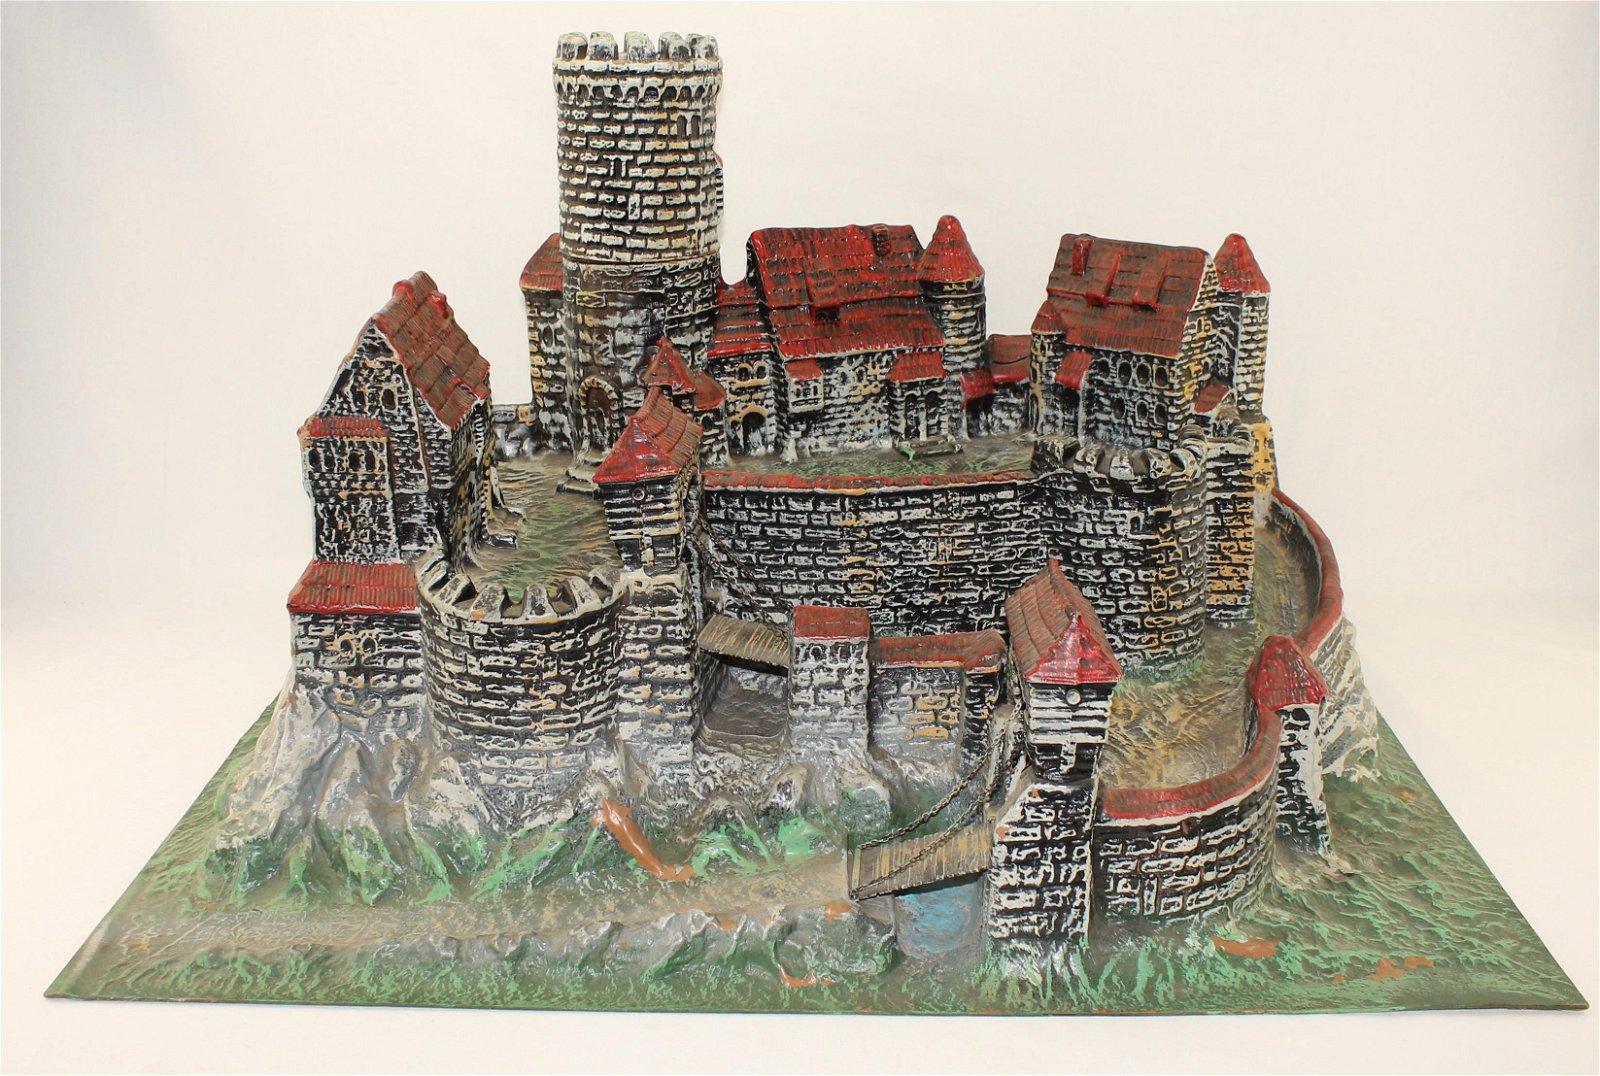 Elastolin Vac-u-Form Castle with Drawbridges